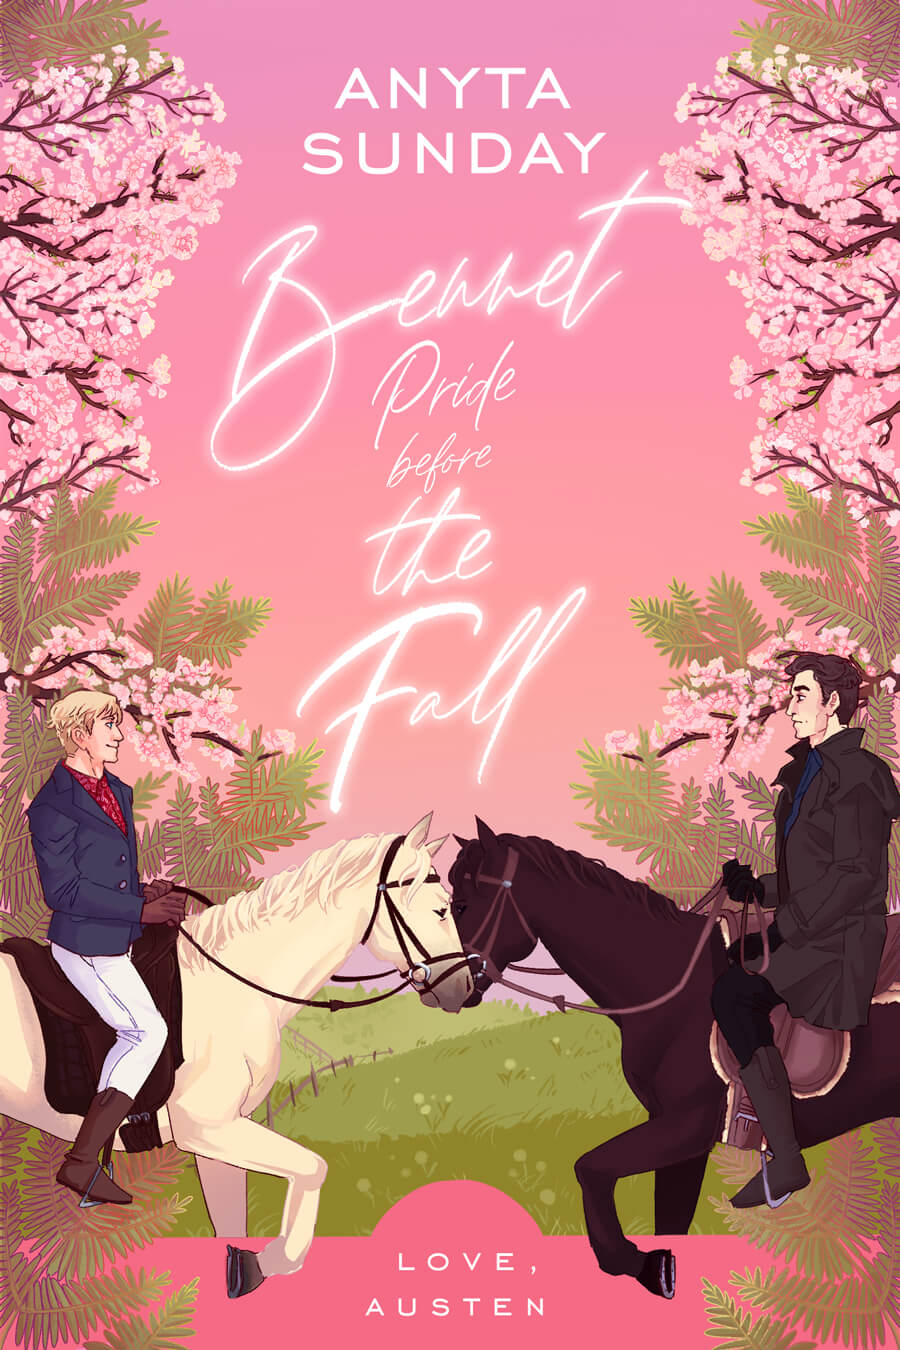 Gay Romance Novel Jane Austen retelling Bennet Pride Before The Fall by Anyta Sunday